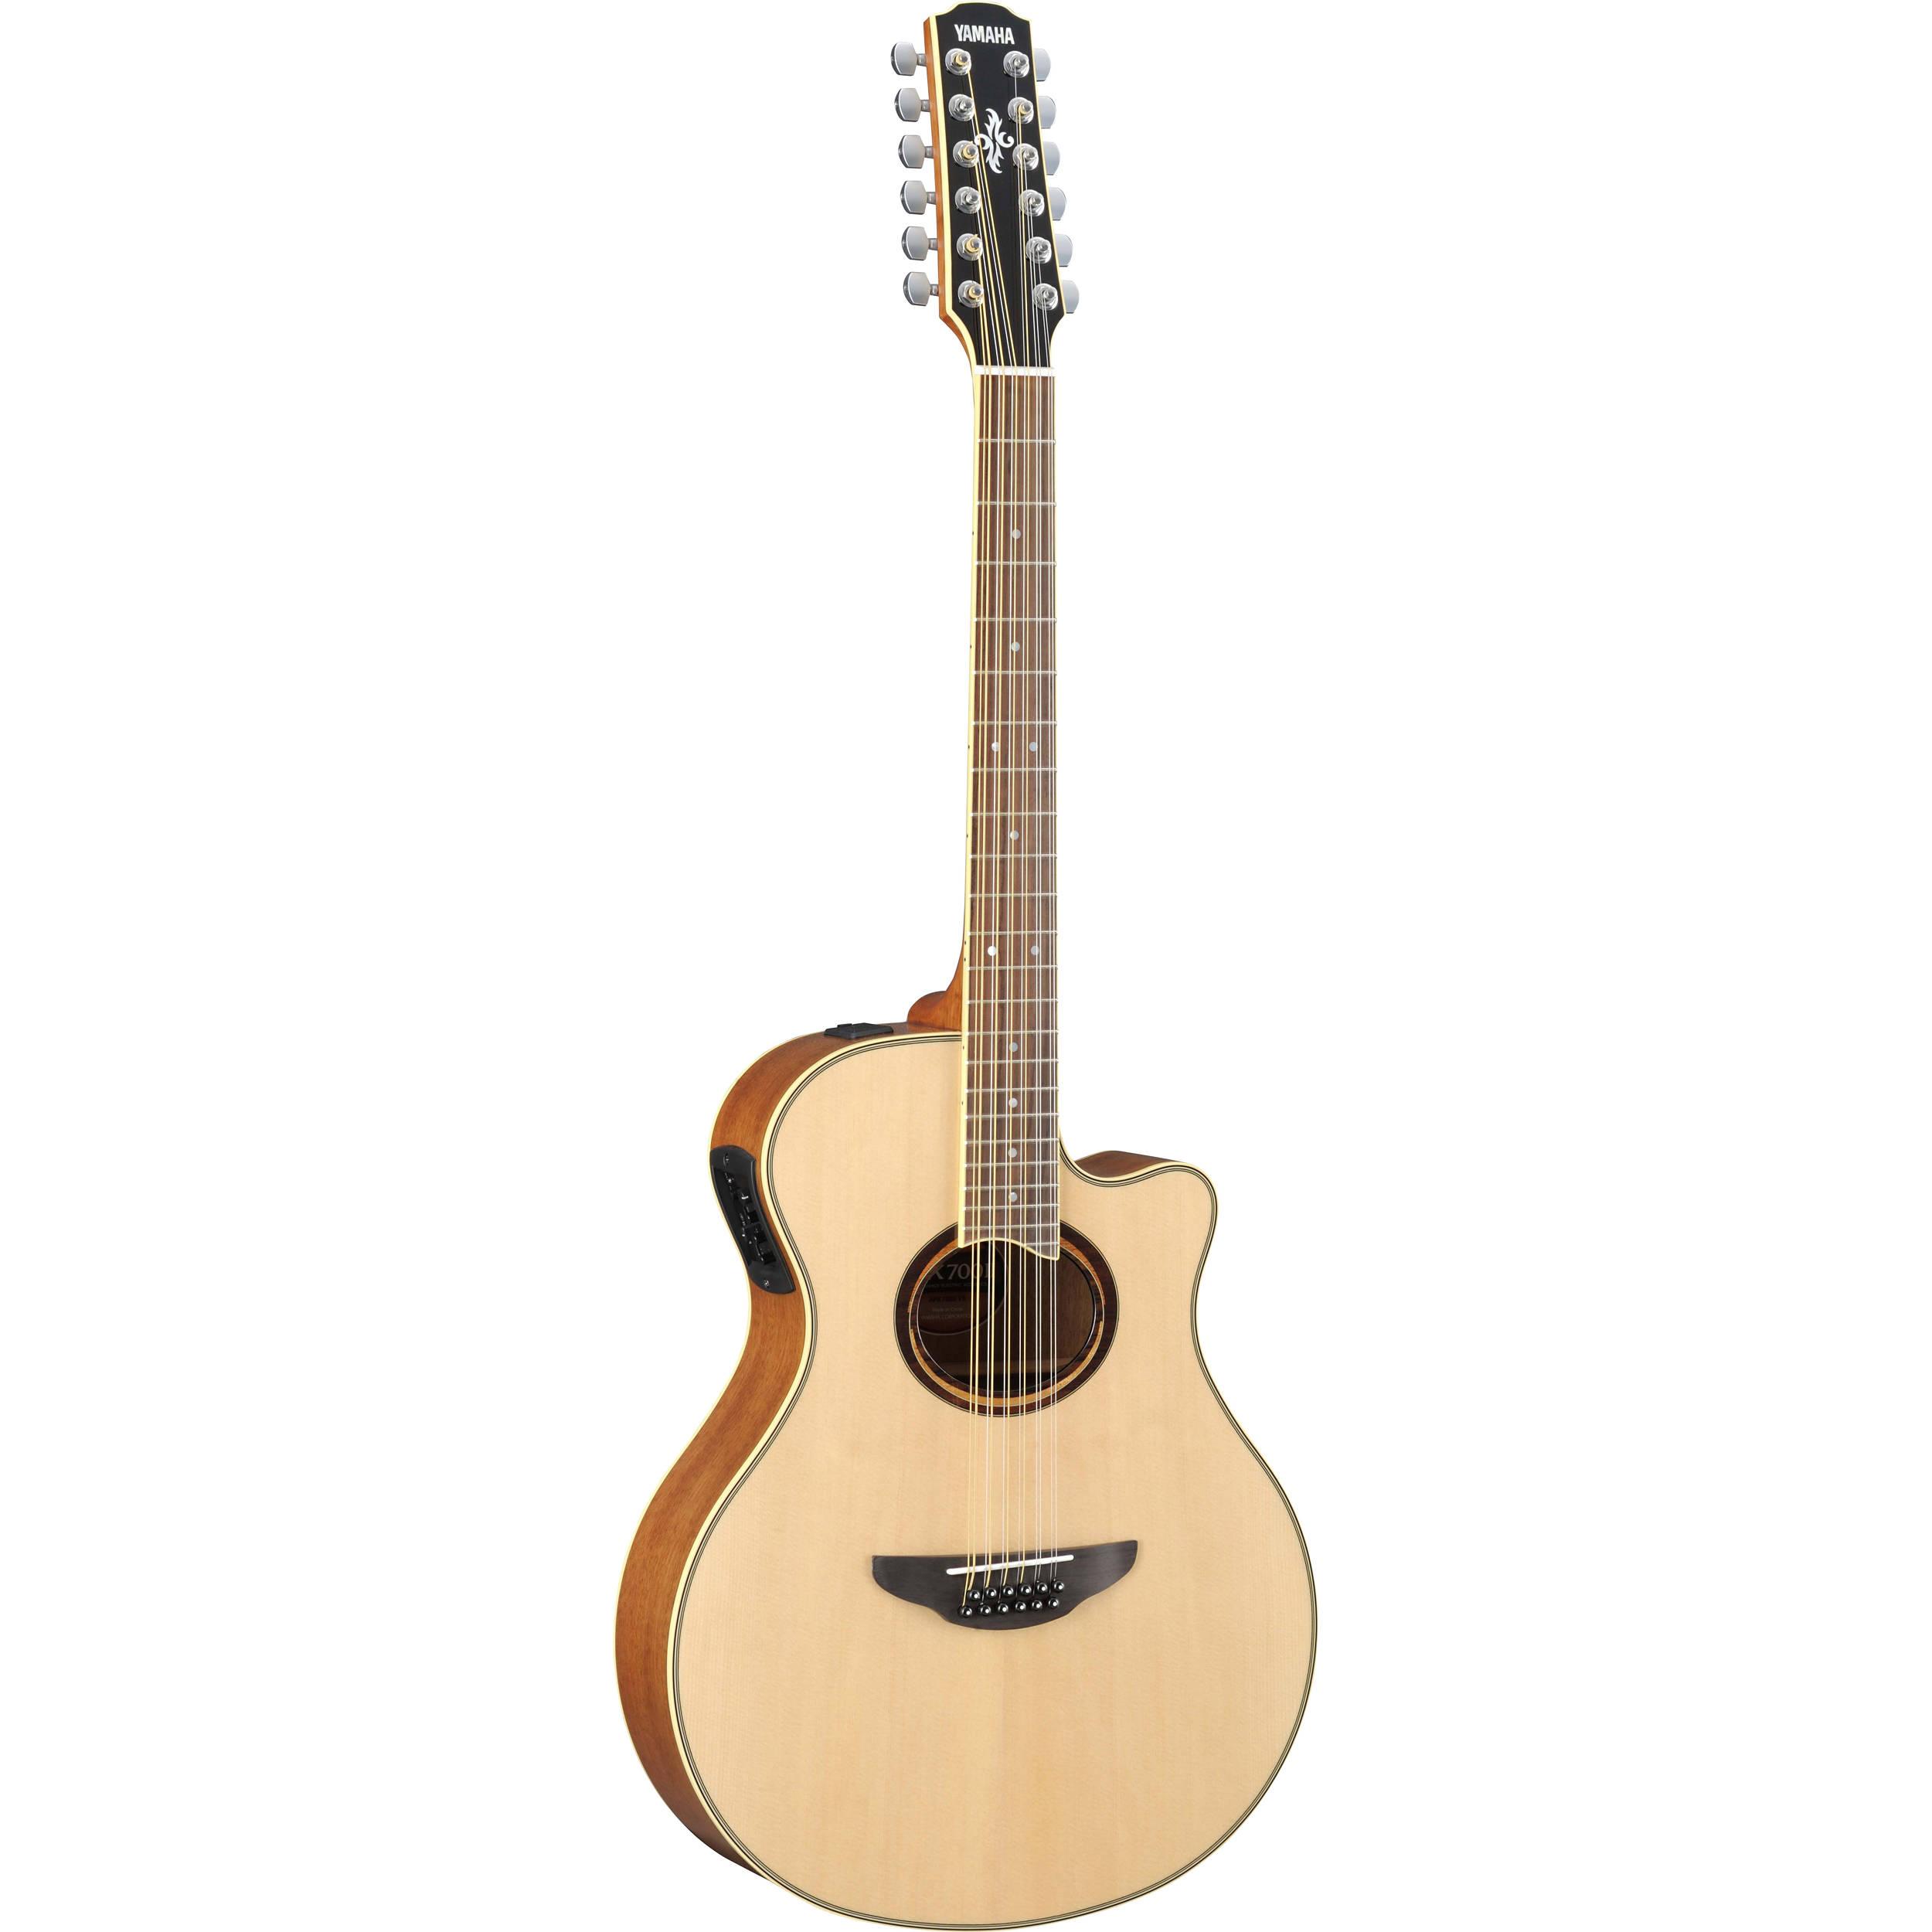 Yamaha Apx700ii 12 Twelve String Thinline Apx700ii 12 B Amp H